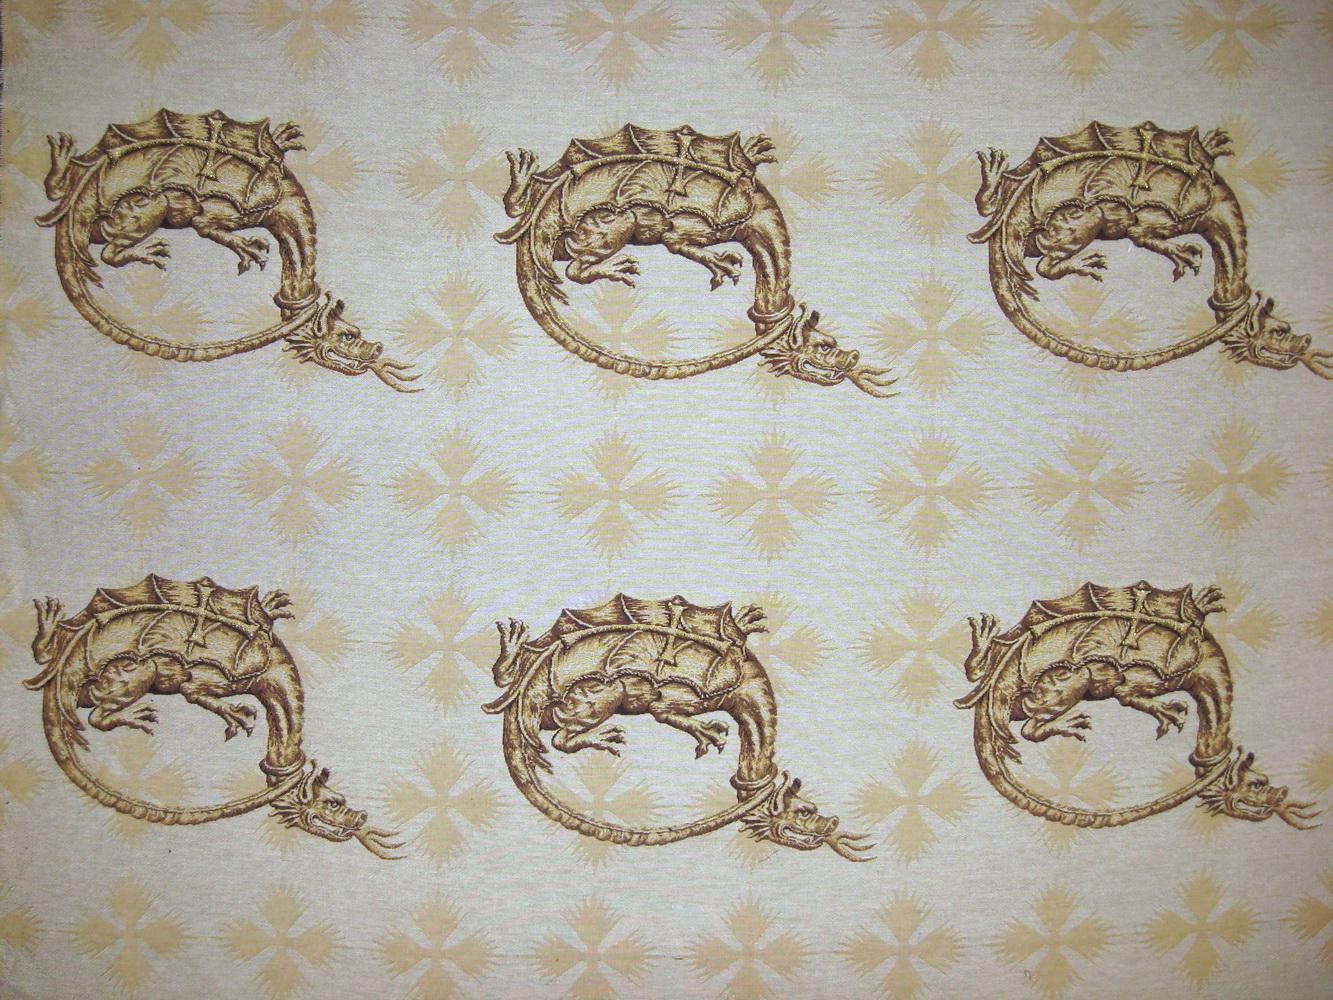 Drachenorden